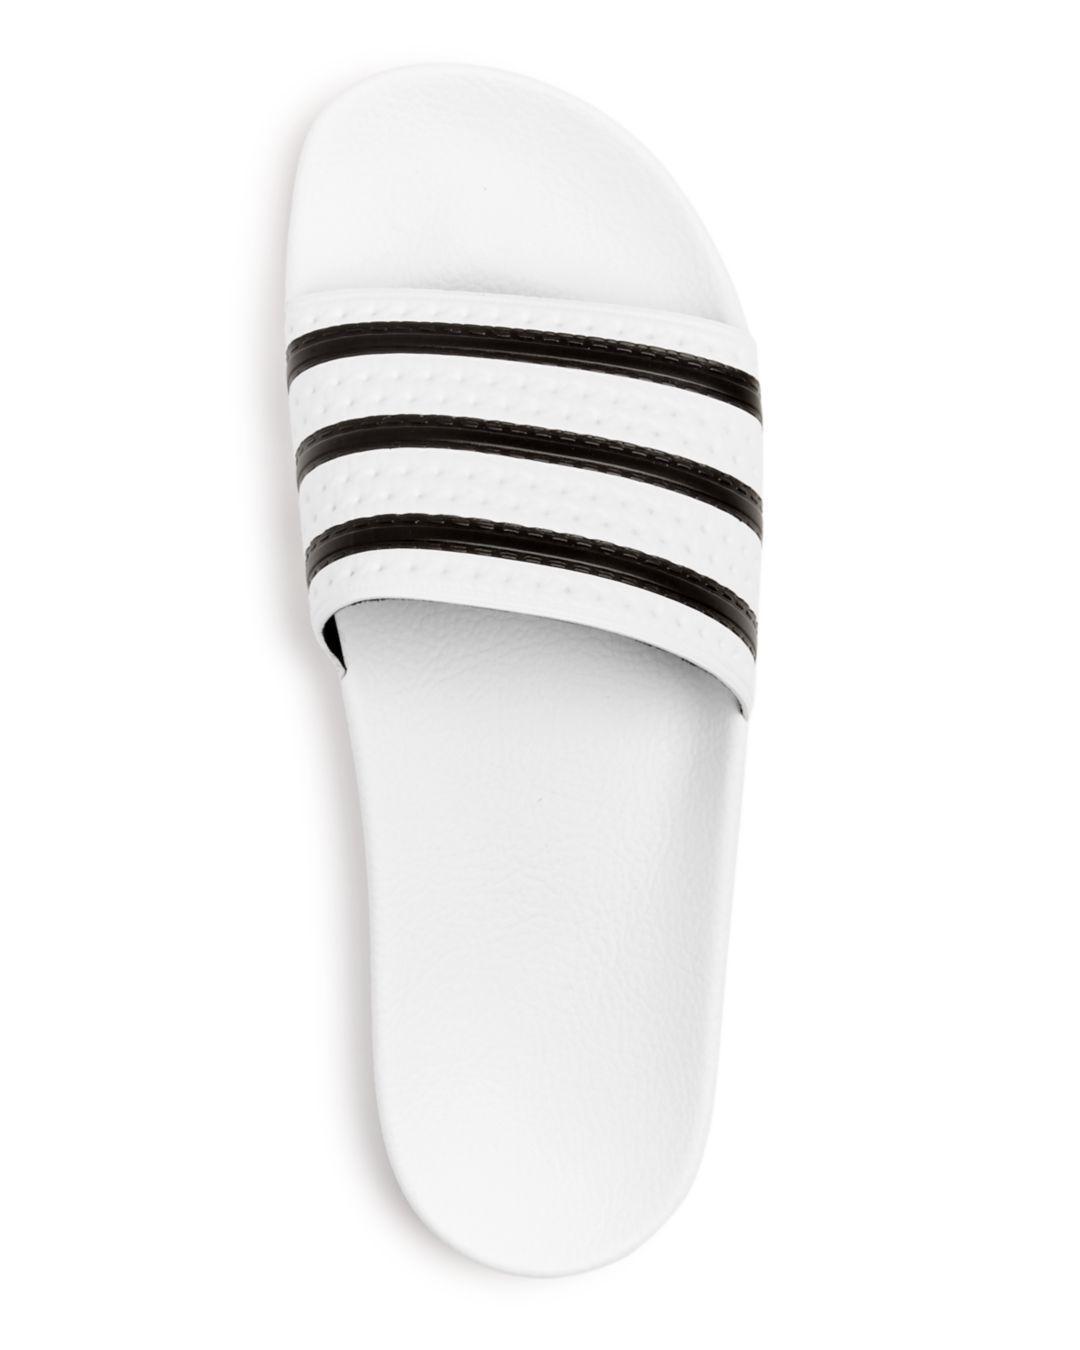 5891c34c436cc Lyst - adidas Adilette Slide Sandals in Blue for Men - Save  38.983050847457626%